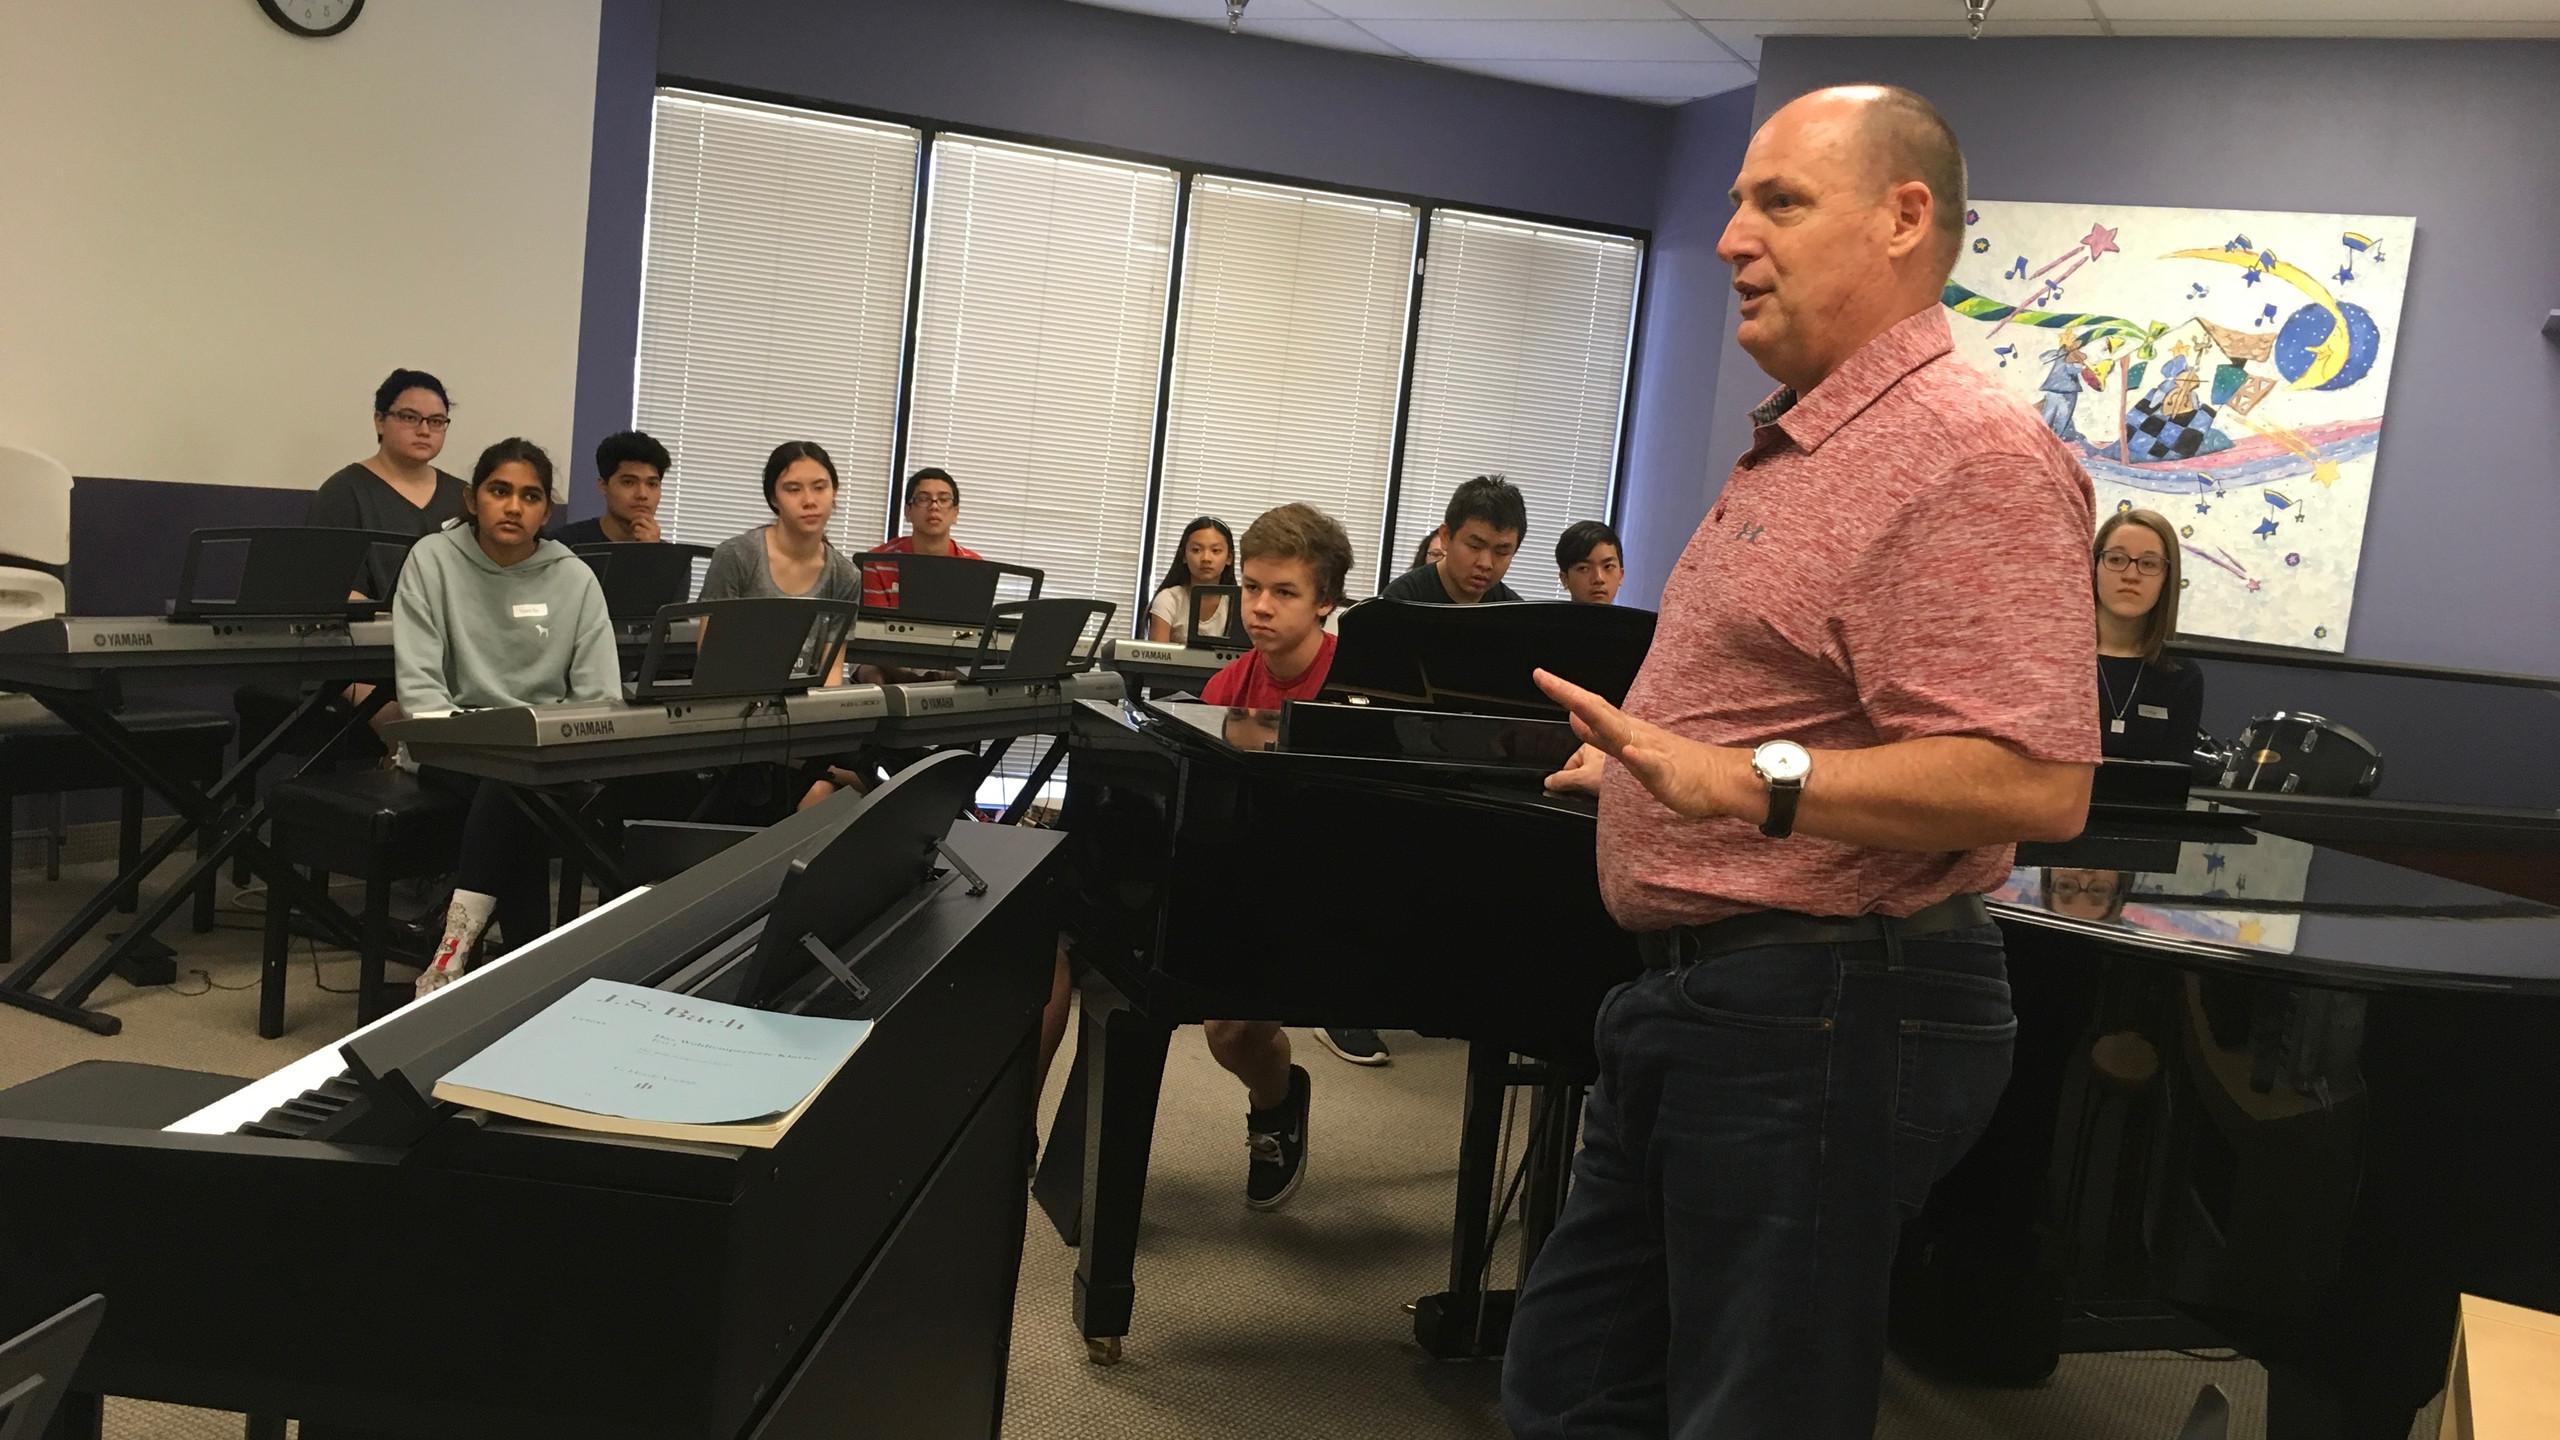 Phillip Keveren Teaching Improvisation Camp